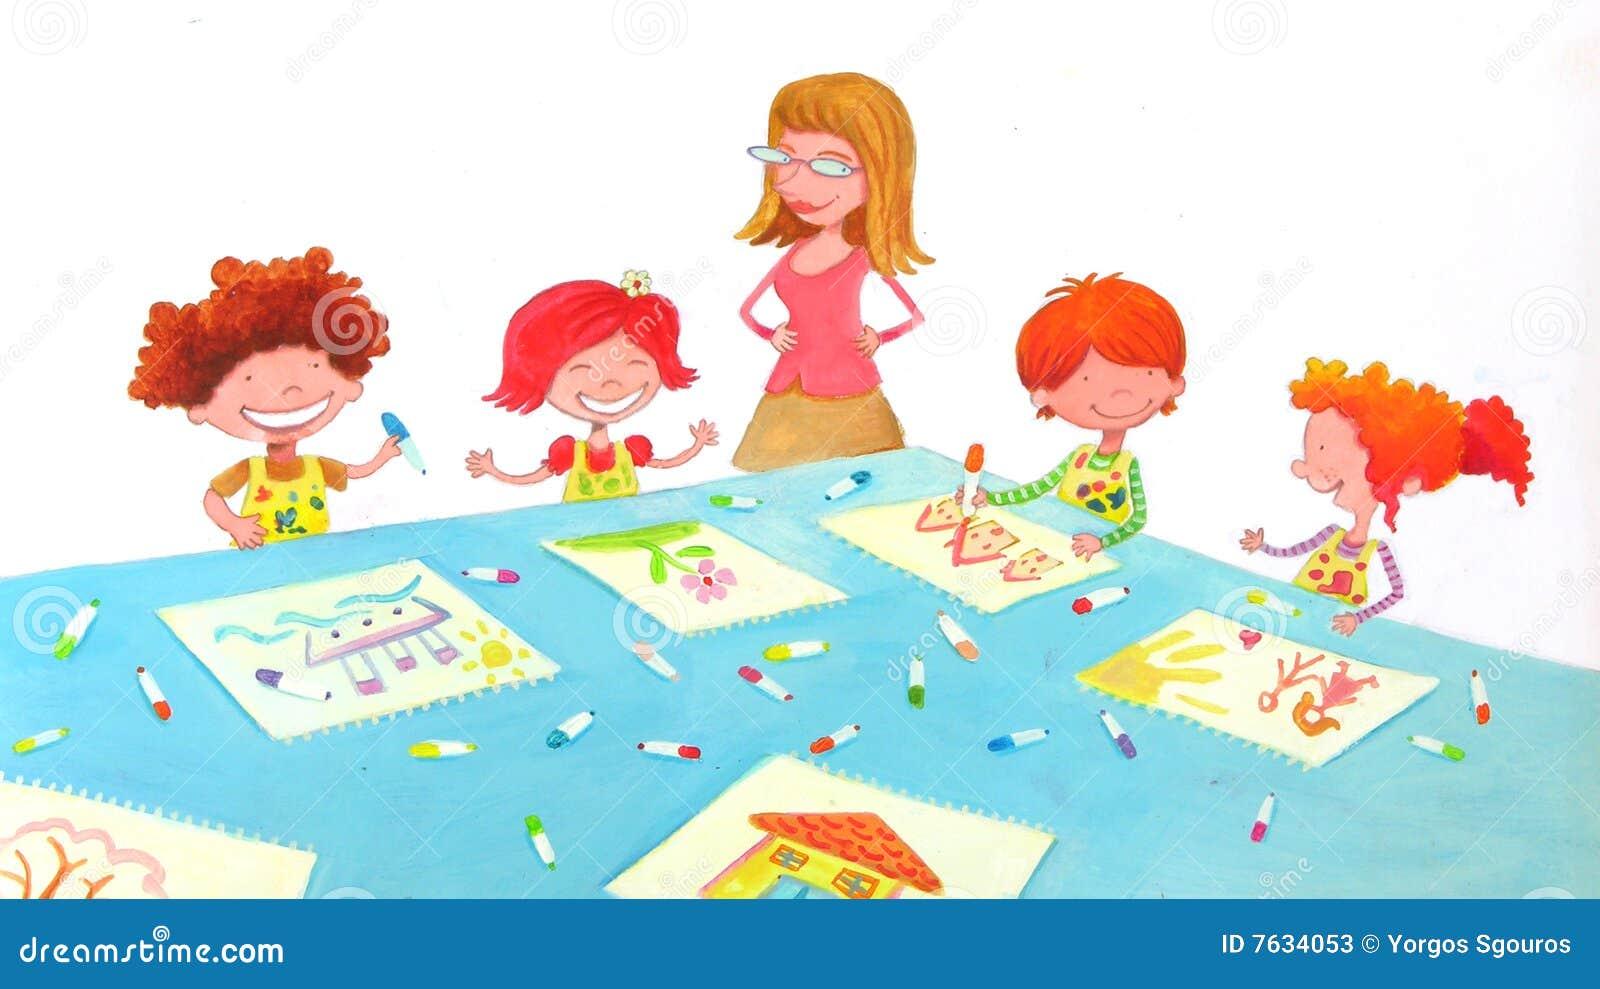 Kinder Garden: Kindergarten Classroom Stock Illustration. Image Of Pretty